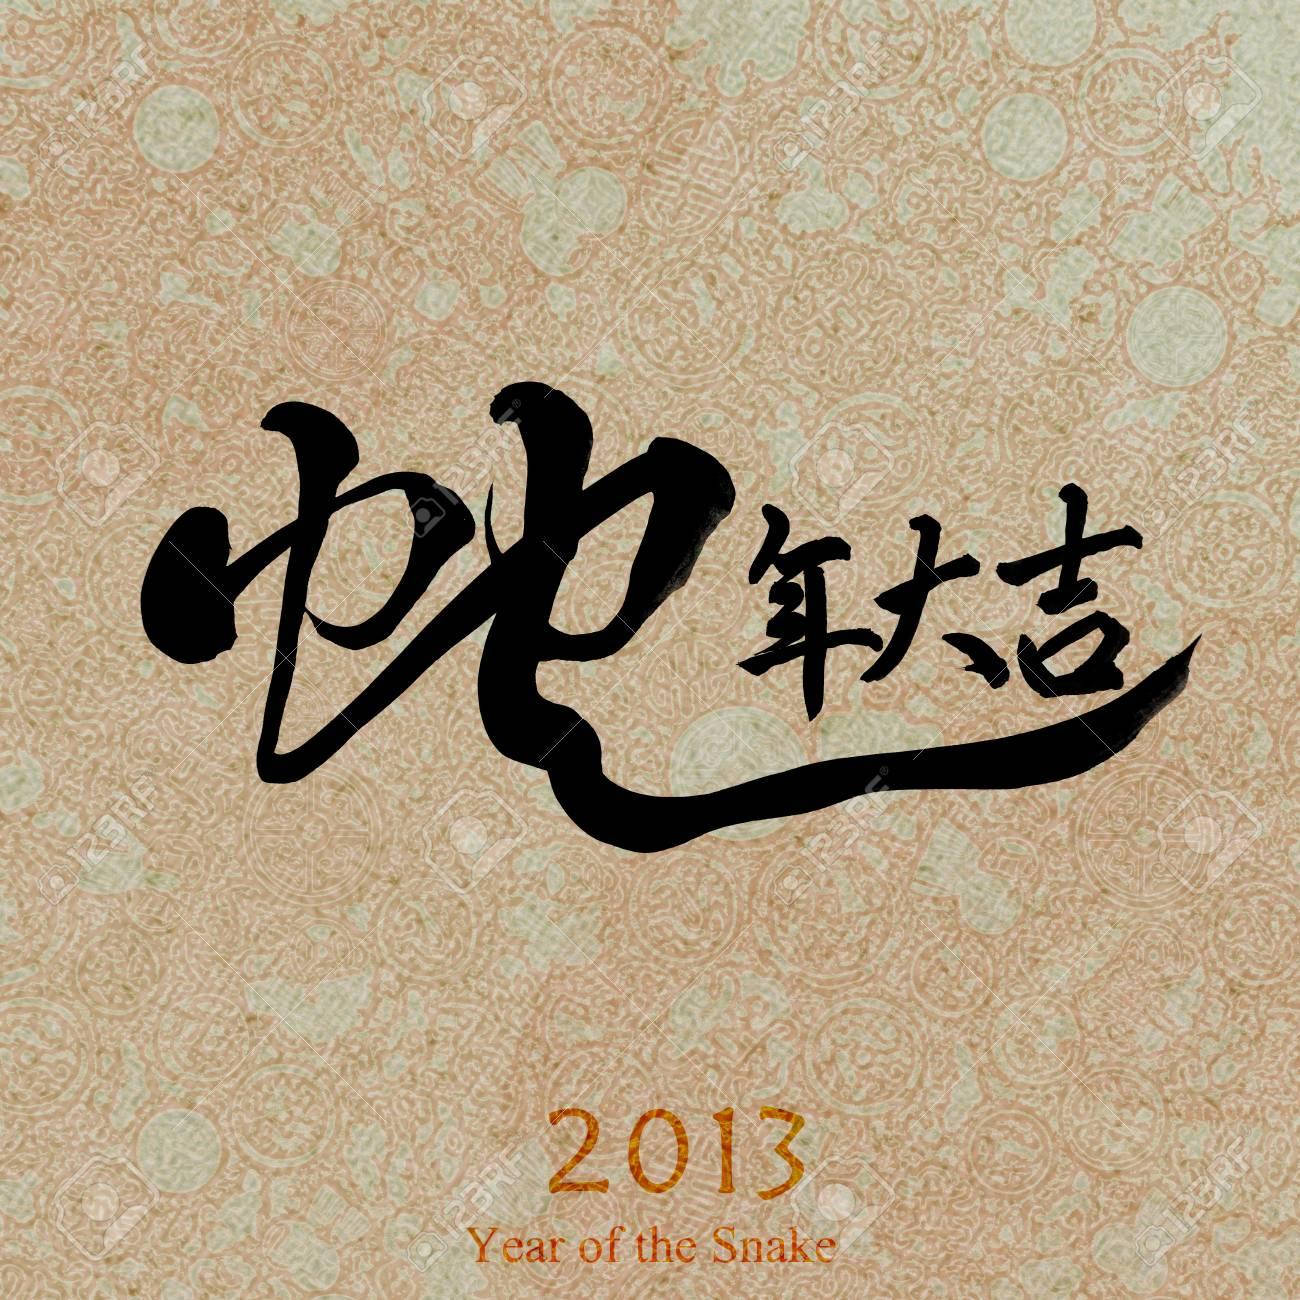 happy snake year 2013 calendar